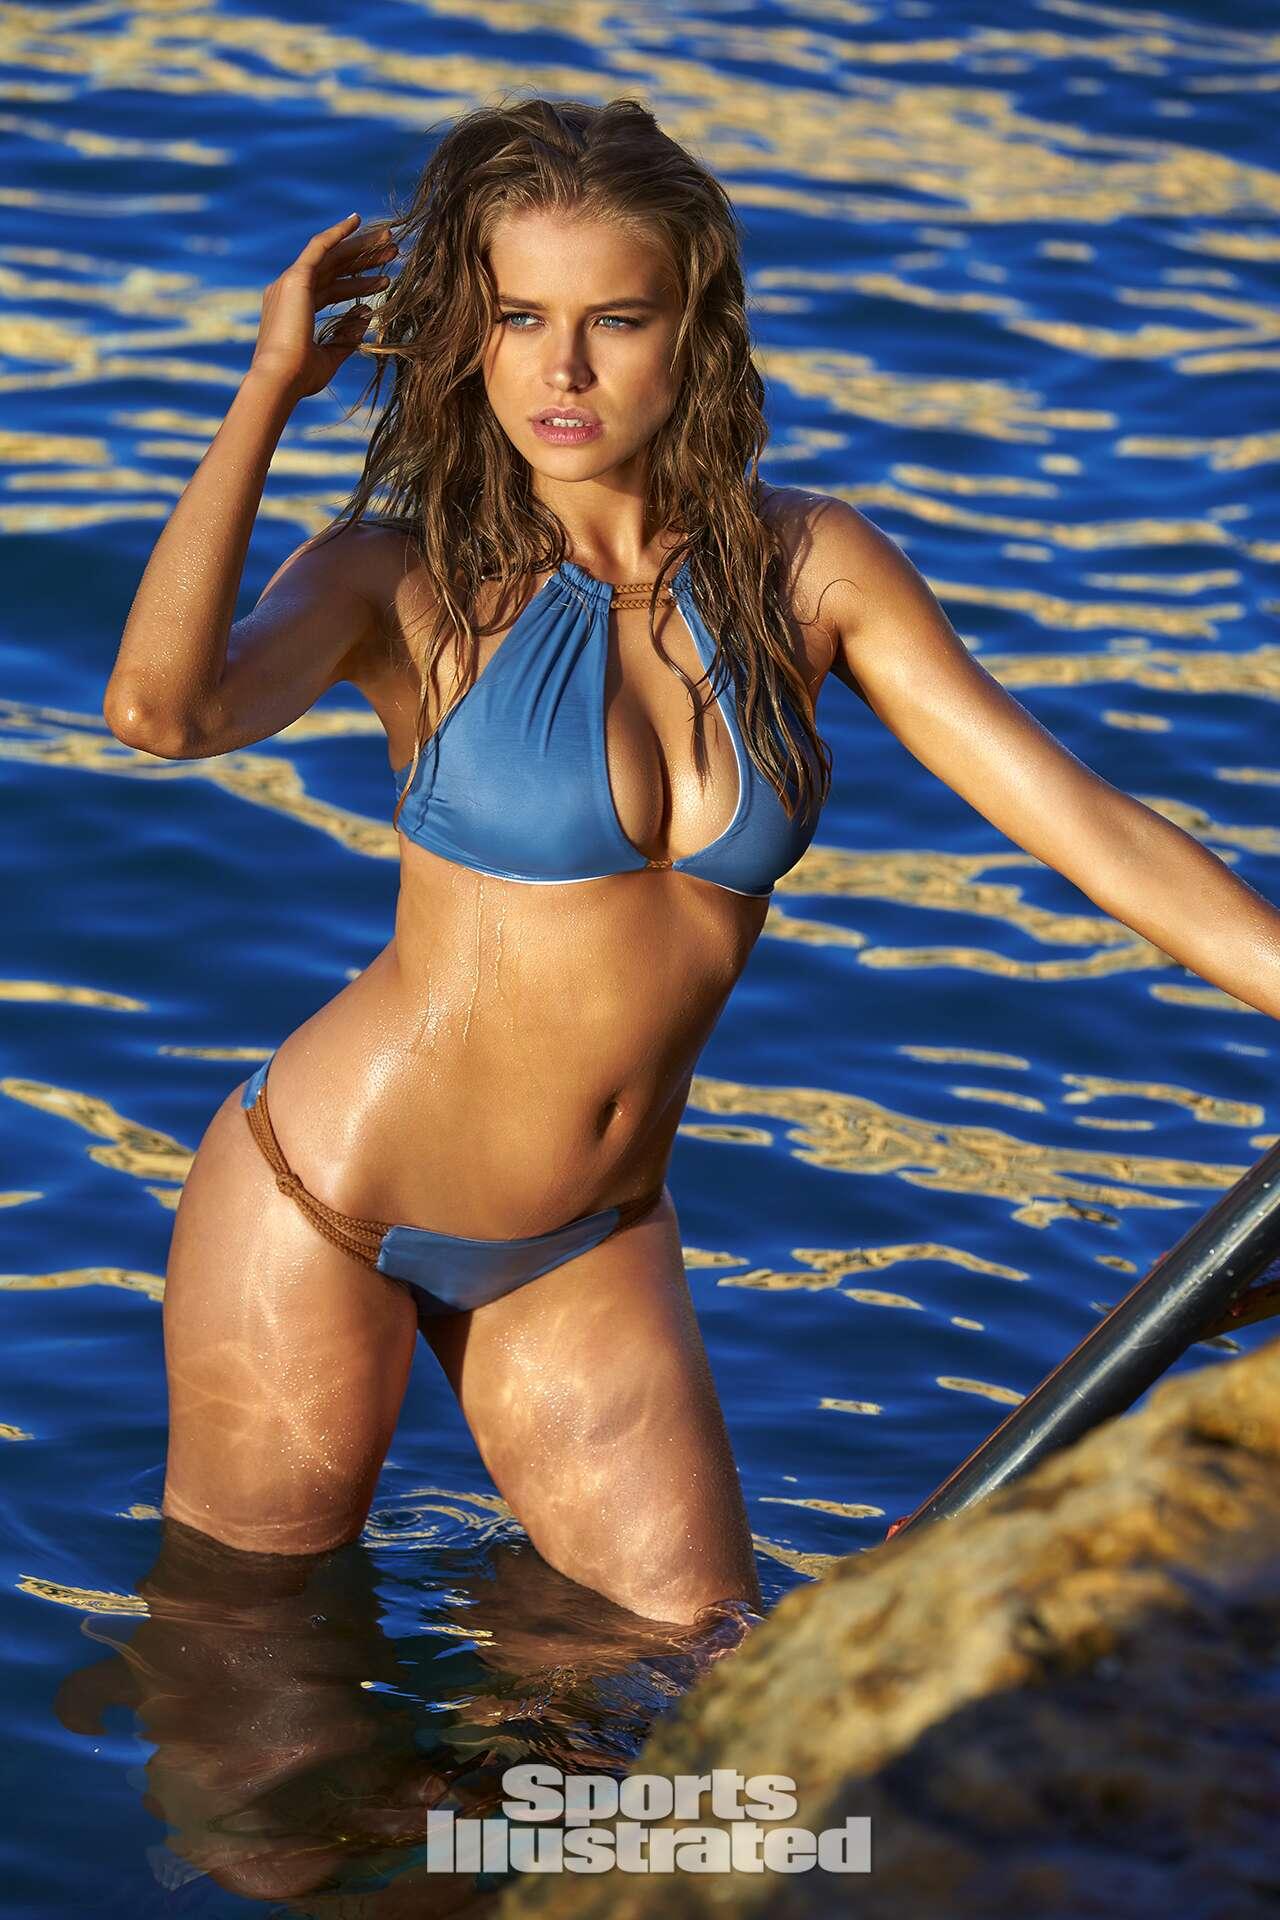 Tanya Mityushina was photographed by Ben Watts in Malta. Swimsuit by KOA Swim.